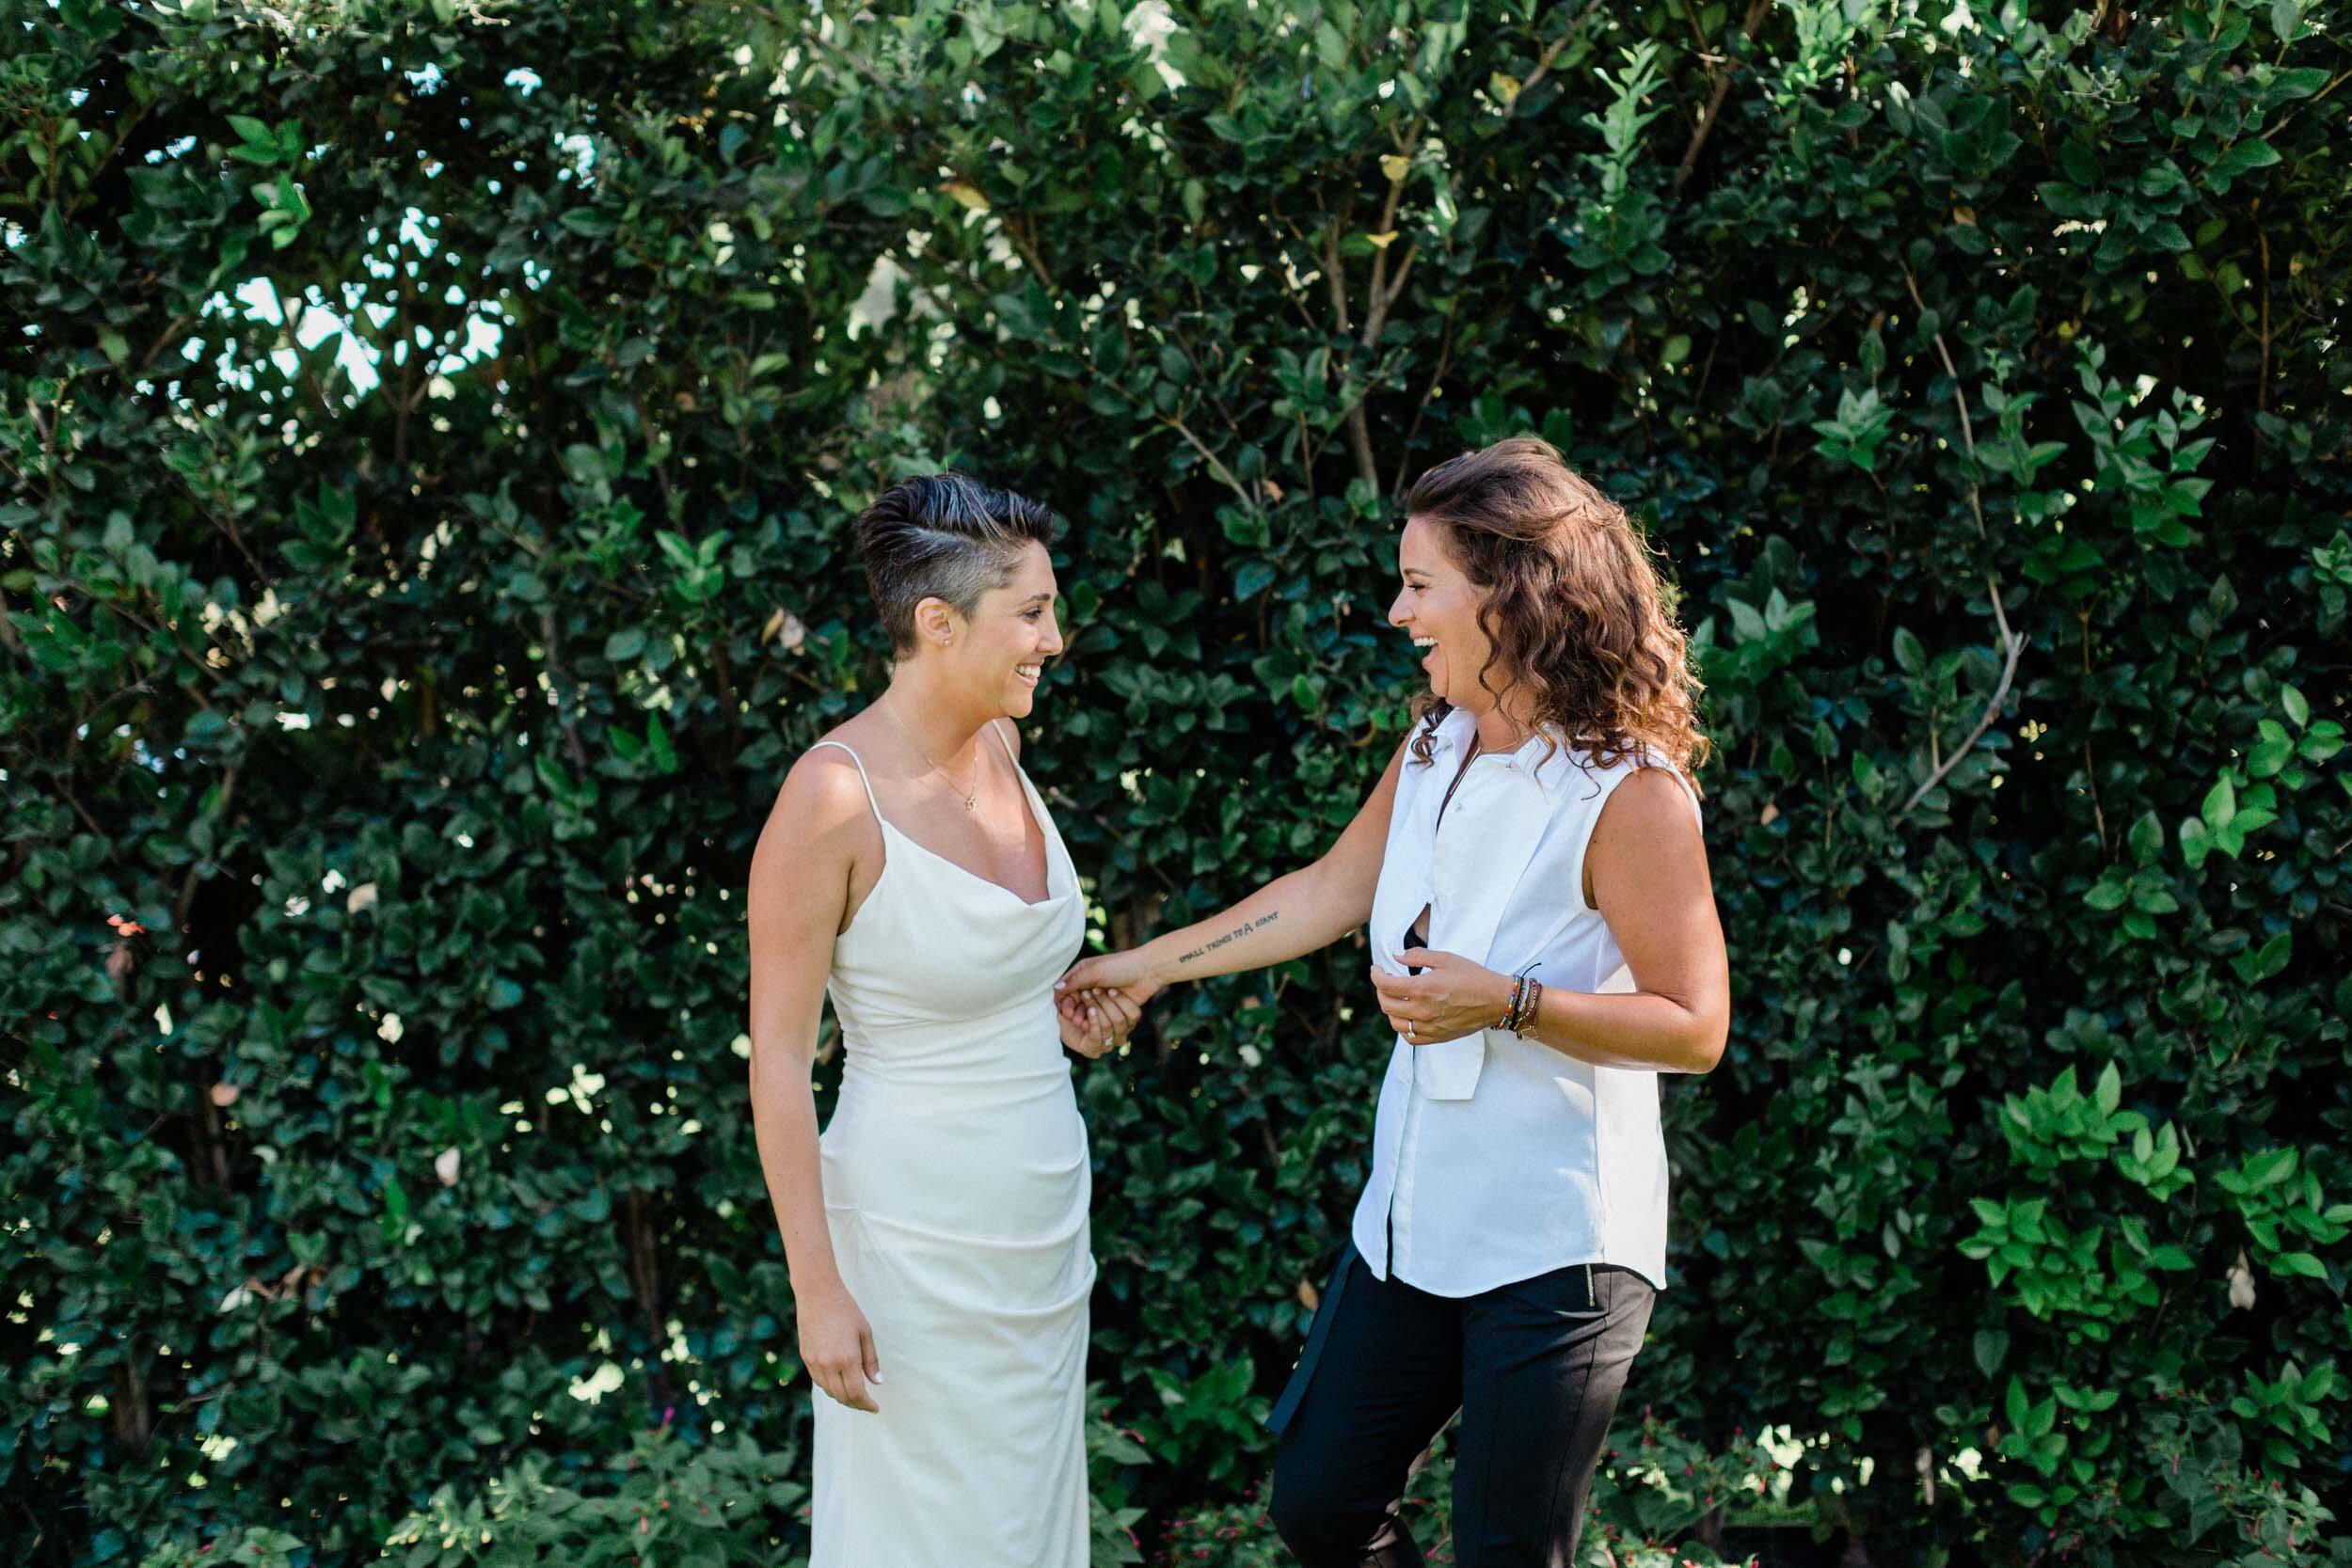 BKM-Photography-Los-Angeles-La-Canada-Flintridge-Wedding-Photographer-0103.jpg